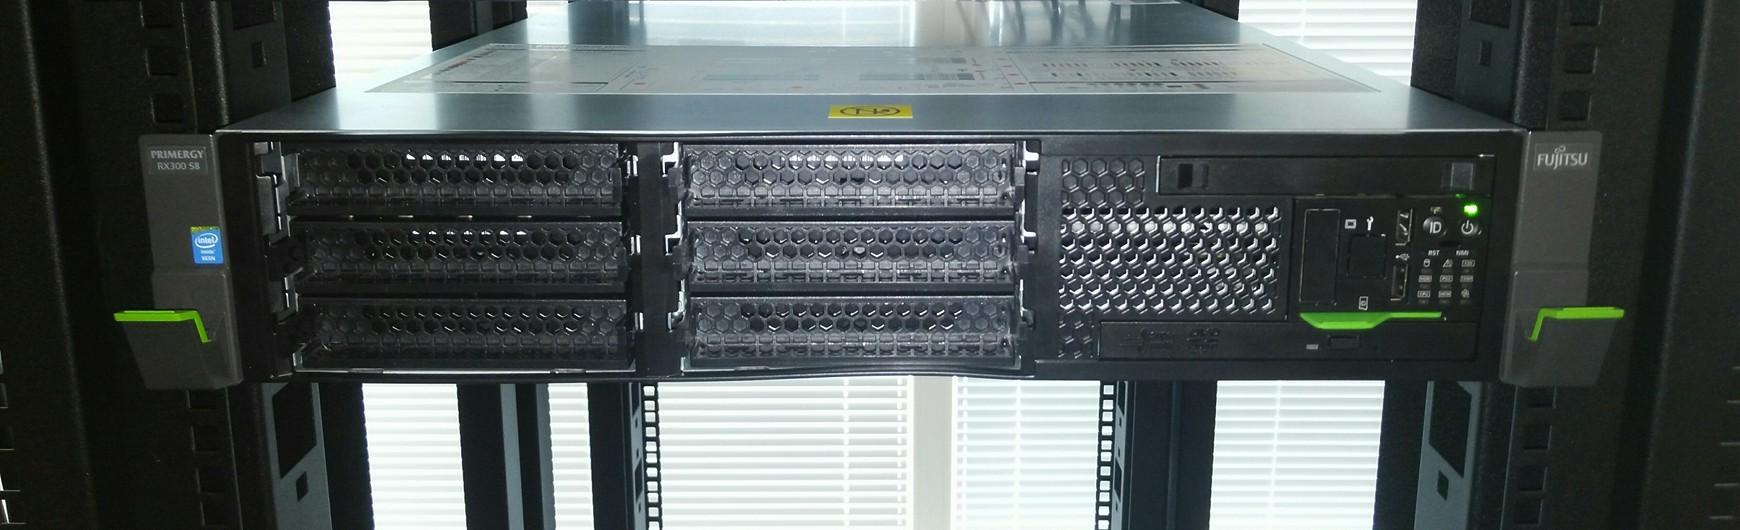 Fujitsu RX300